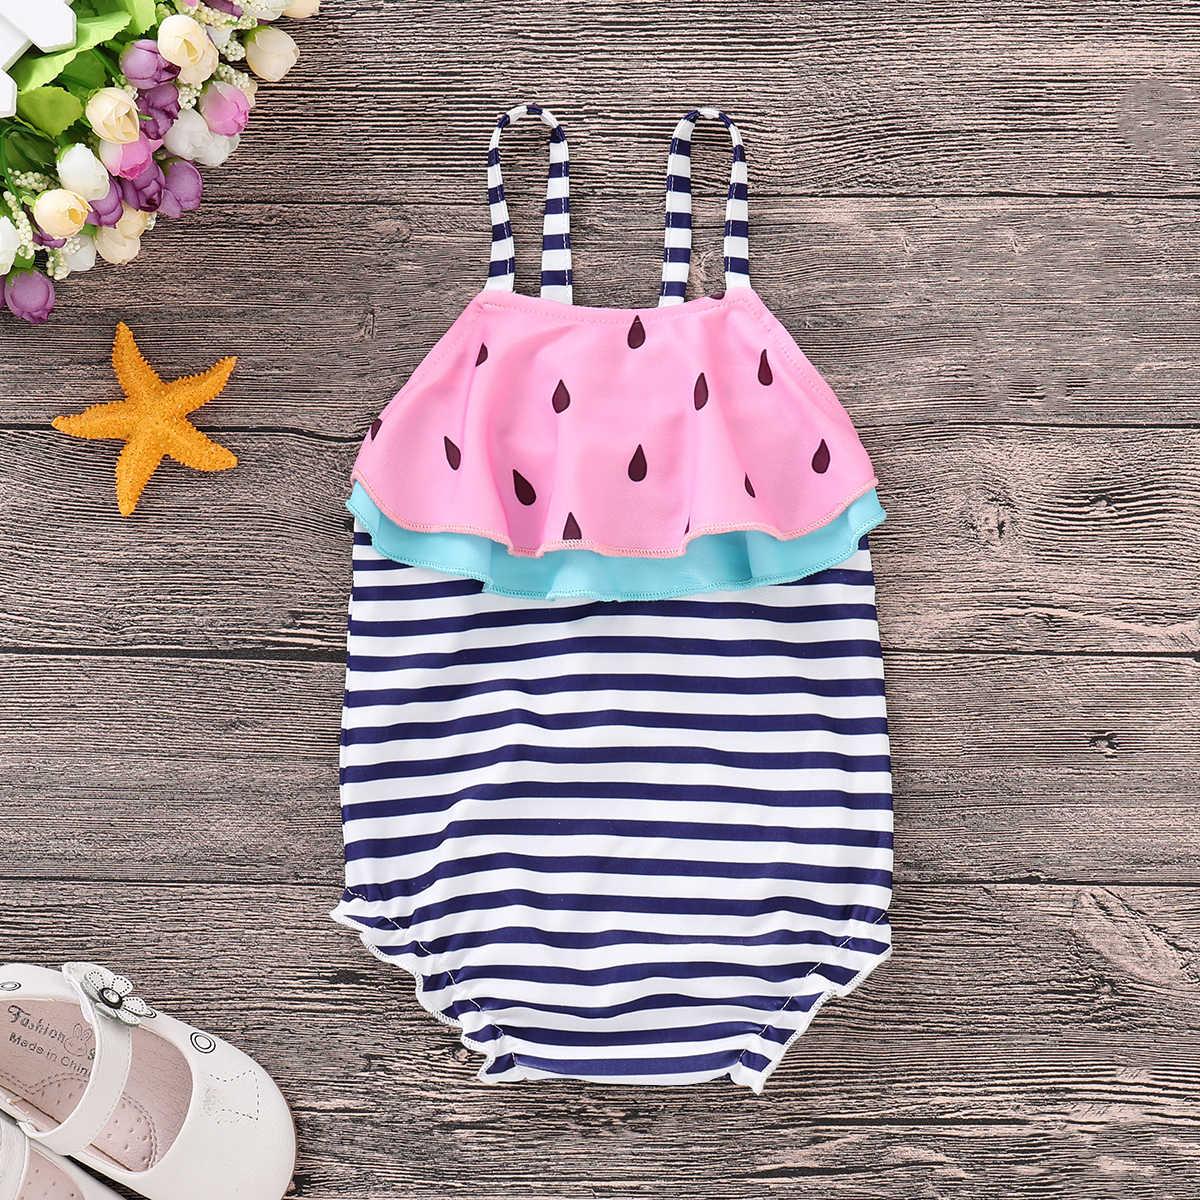 b6977163c ... Toddler Kids Baby Girl Swimwear 2019 Ruffle Watermelon Striped One  Piece Bikini Summer Baby Girl Swimsuit ...